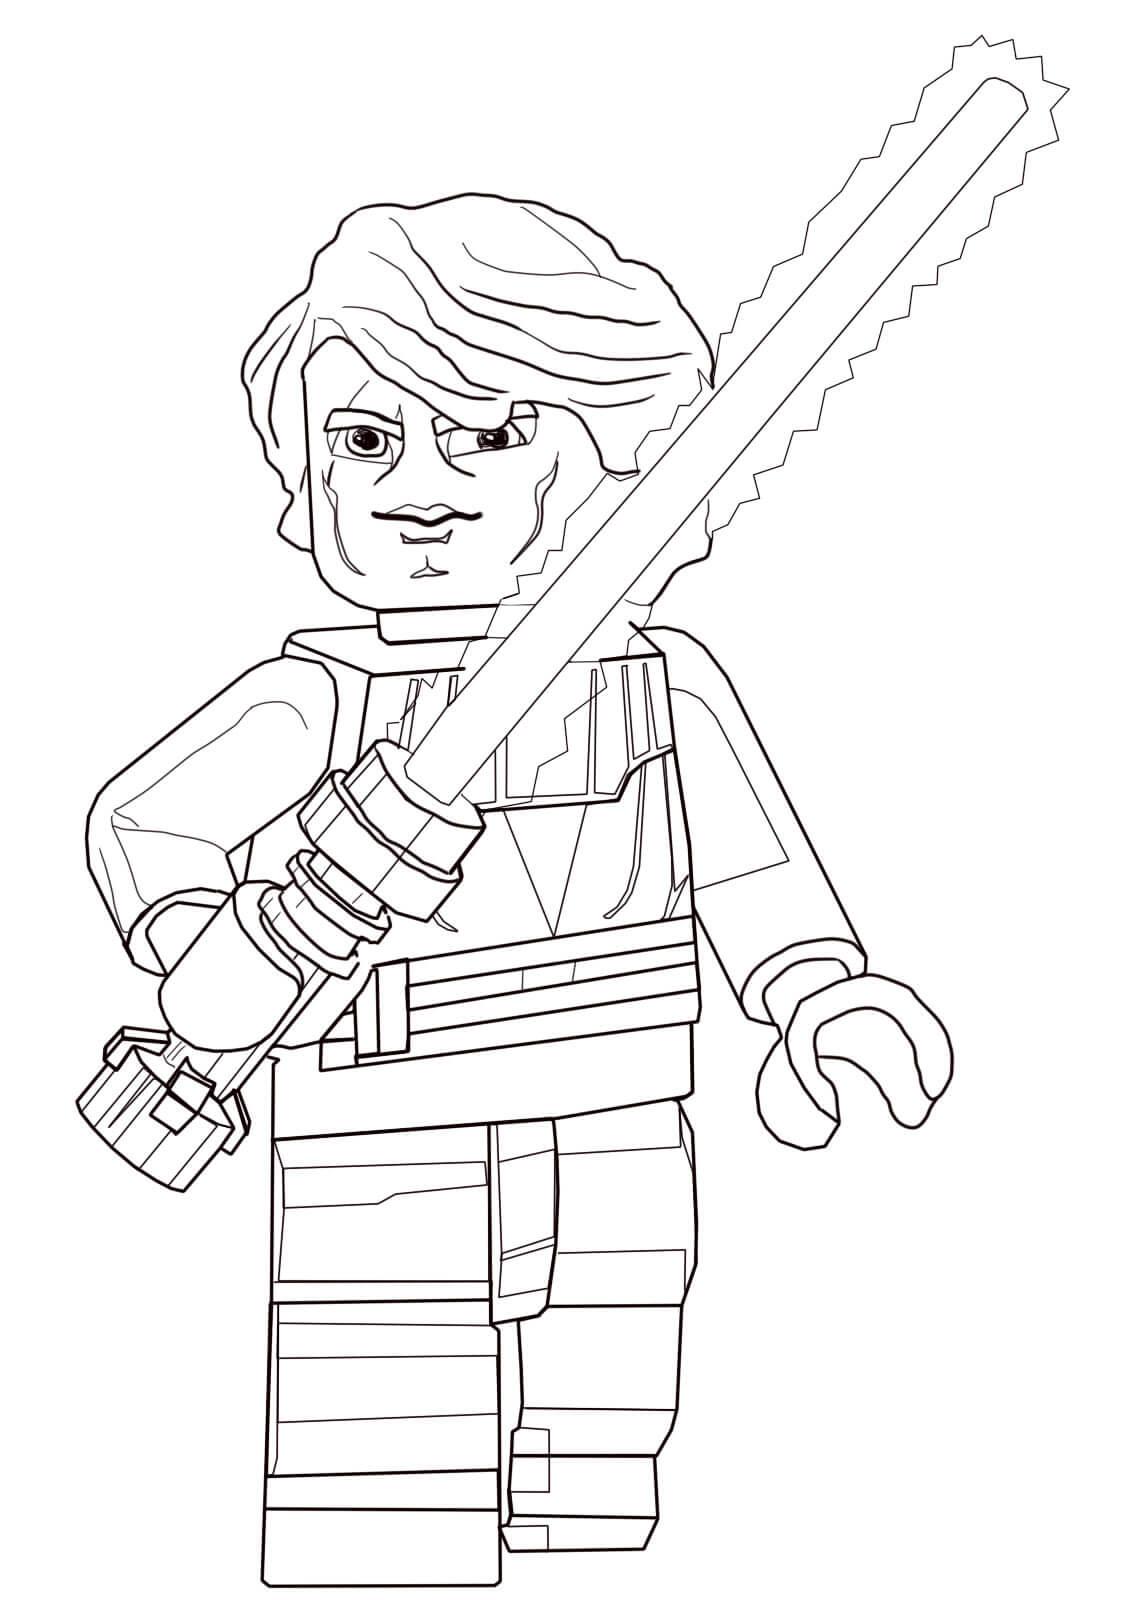 Anakin Skywalker from Lego Star Wars